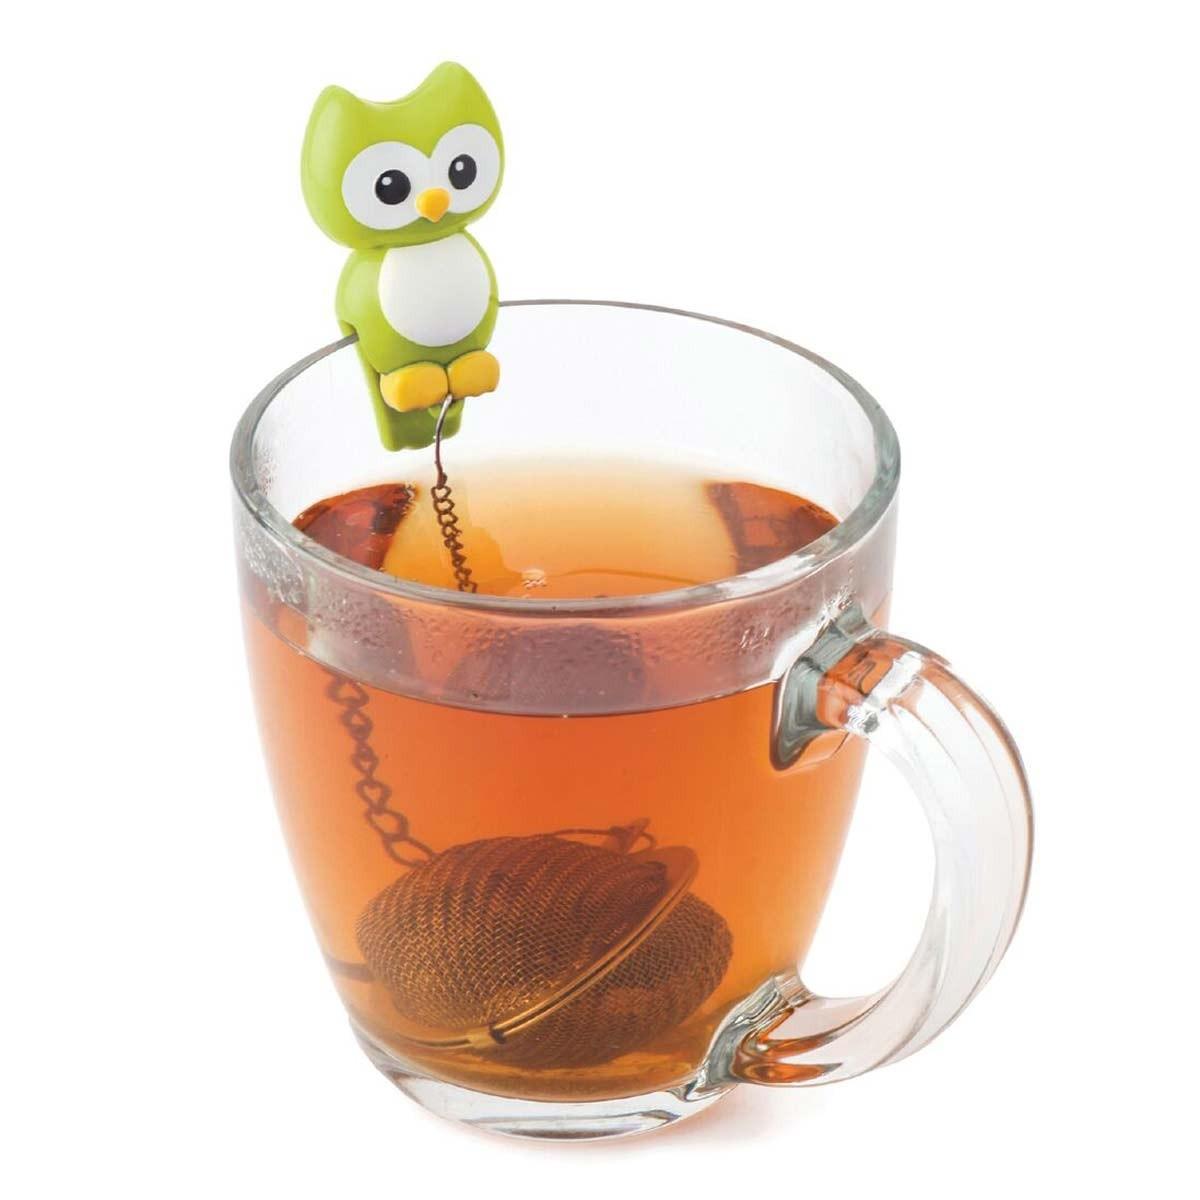 English Tea Supplies: Tea Accessories Gifts